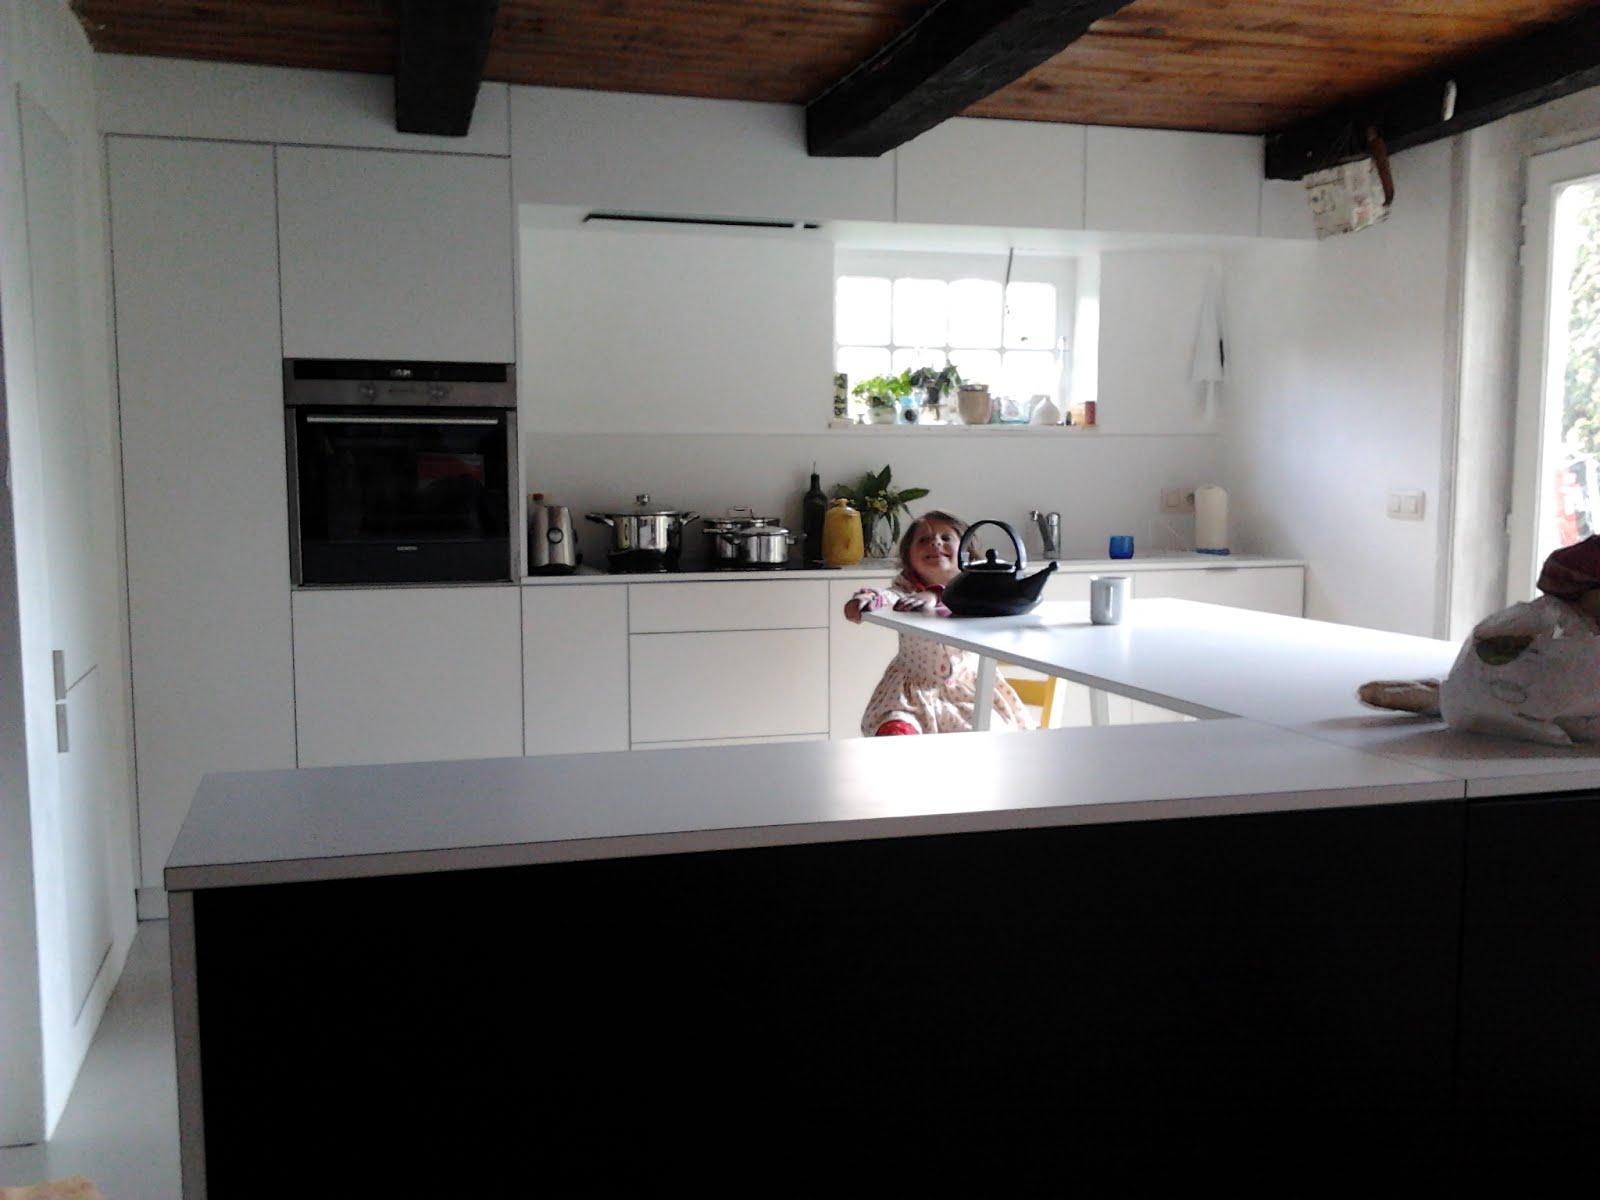 lj woodworks cuisine m lamin blanc mat pdt en stratifi blanc mat armoires c t salon en. Black Bedroom Furniture Sets. Home Design Ideas